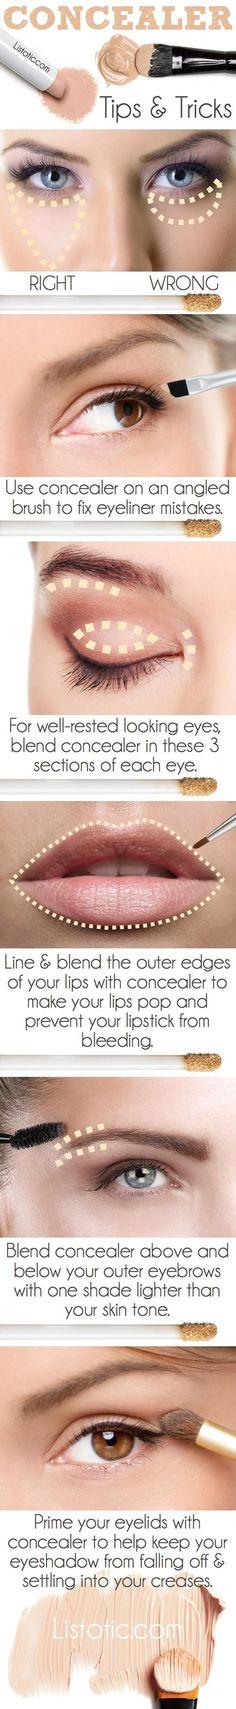 Makeup Tricks -                                                              The best eye makeup tricks for girls with small eyes (via Byrdie Beauty) // #Eyes #Tips